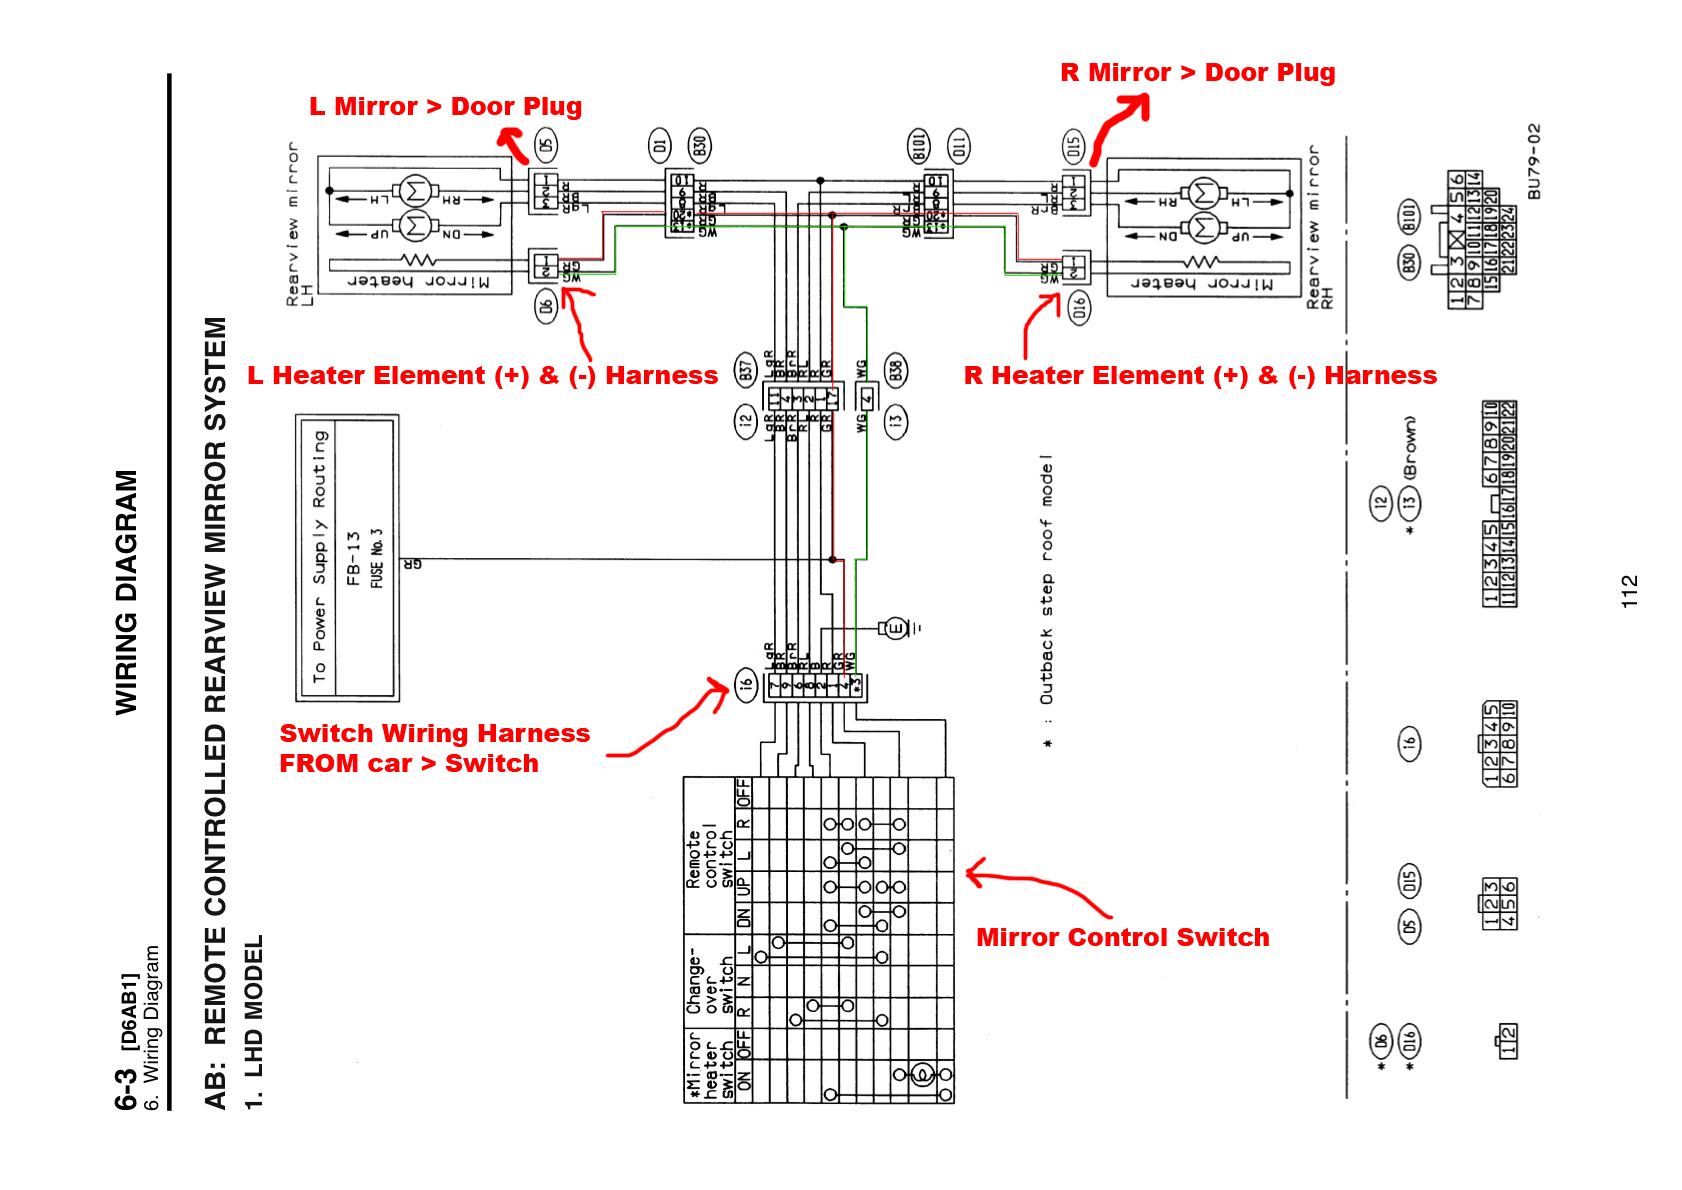 Astonishing 92 Subaru Legacy Stereo Wiring Diagram Basic Electronics Wiring Wiring Cloud Biosomenaidewilluminateatxorg